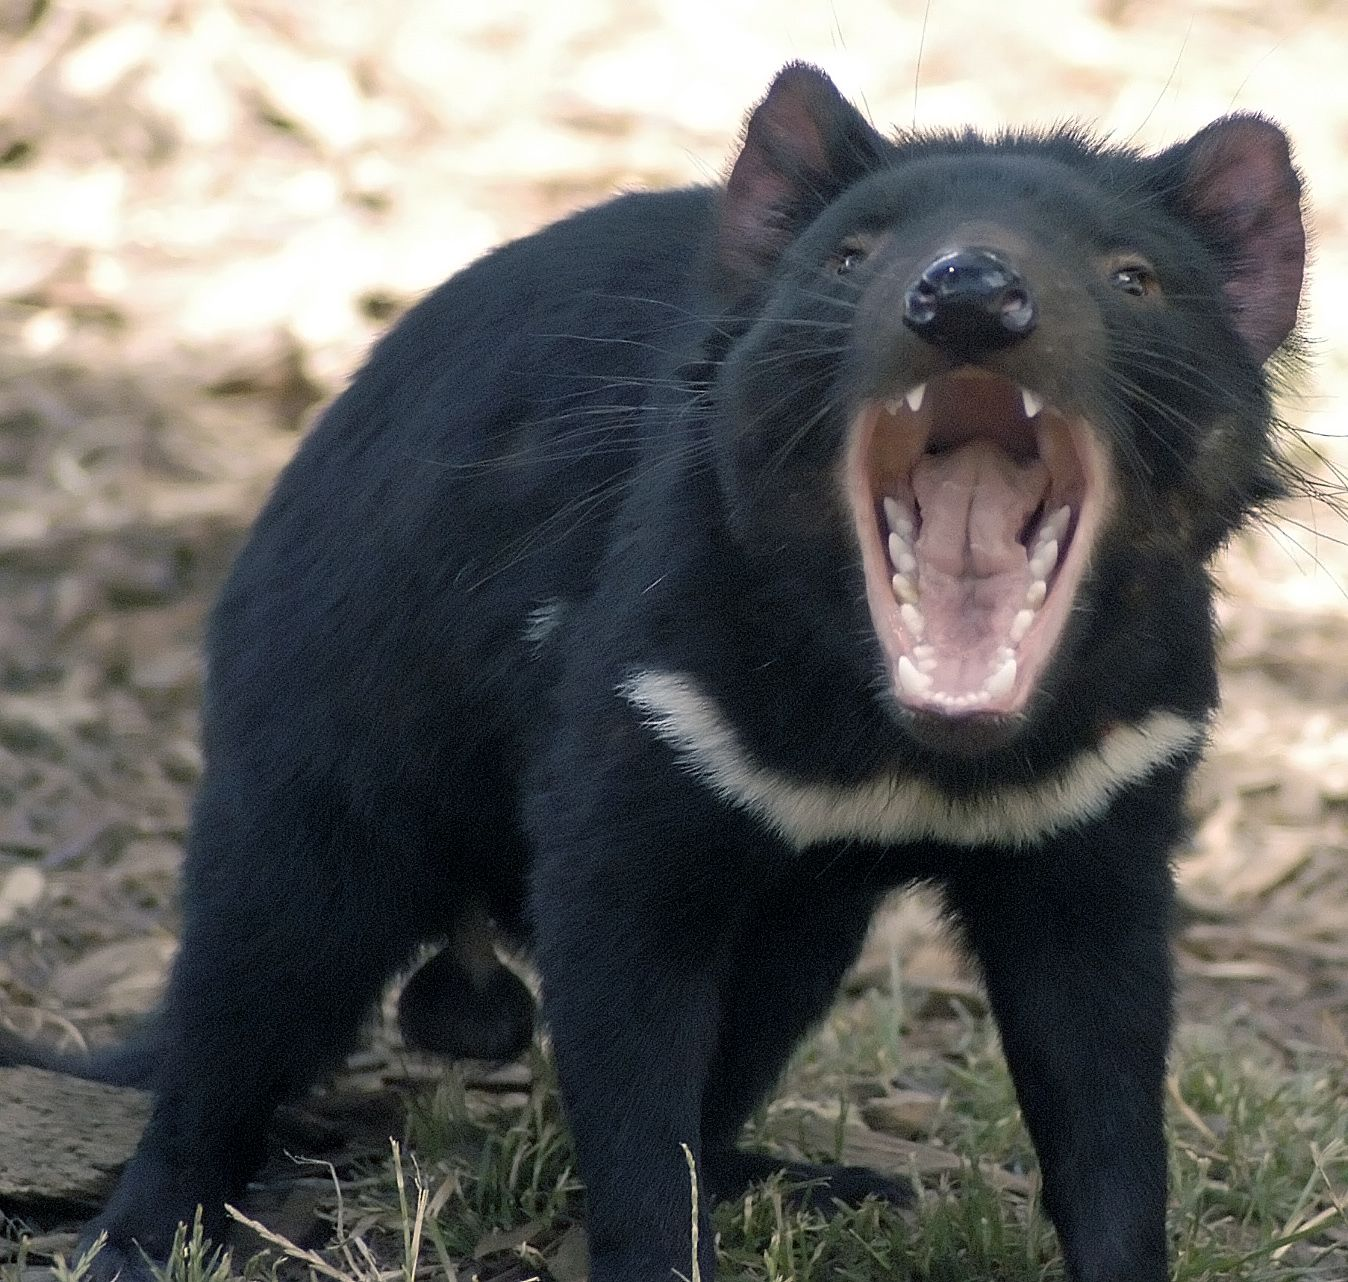 Tasmanian Devil Animal I enjoy seeing at wild animals